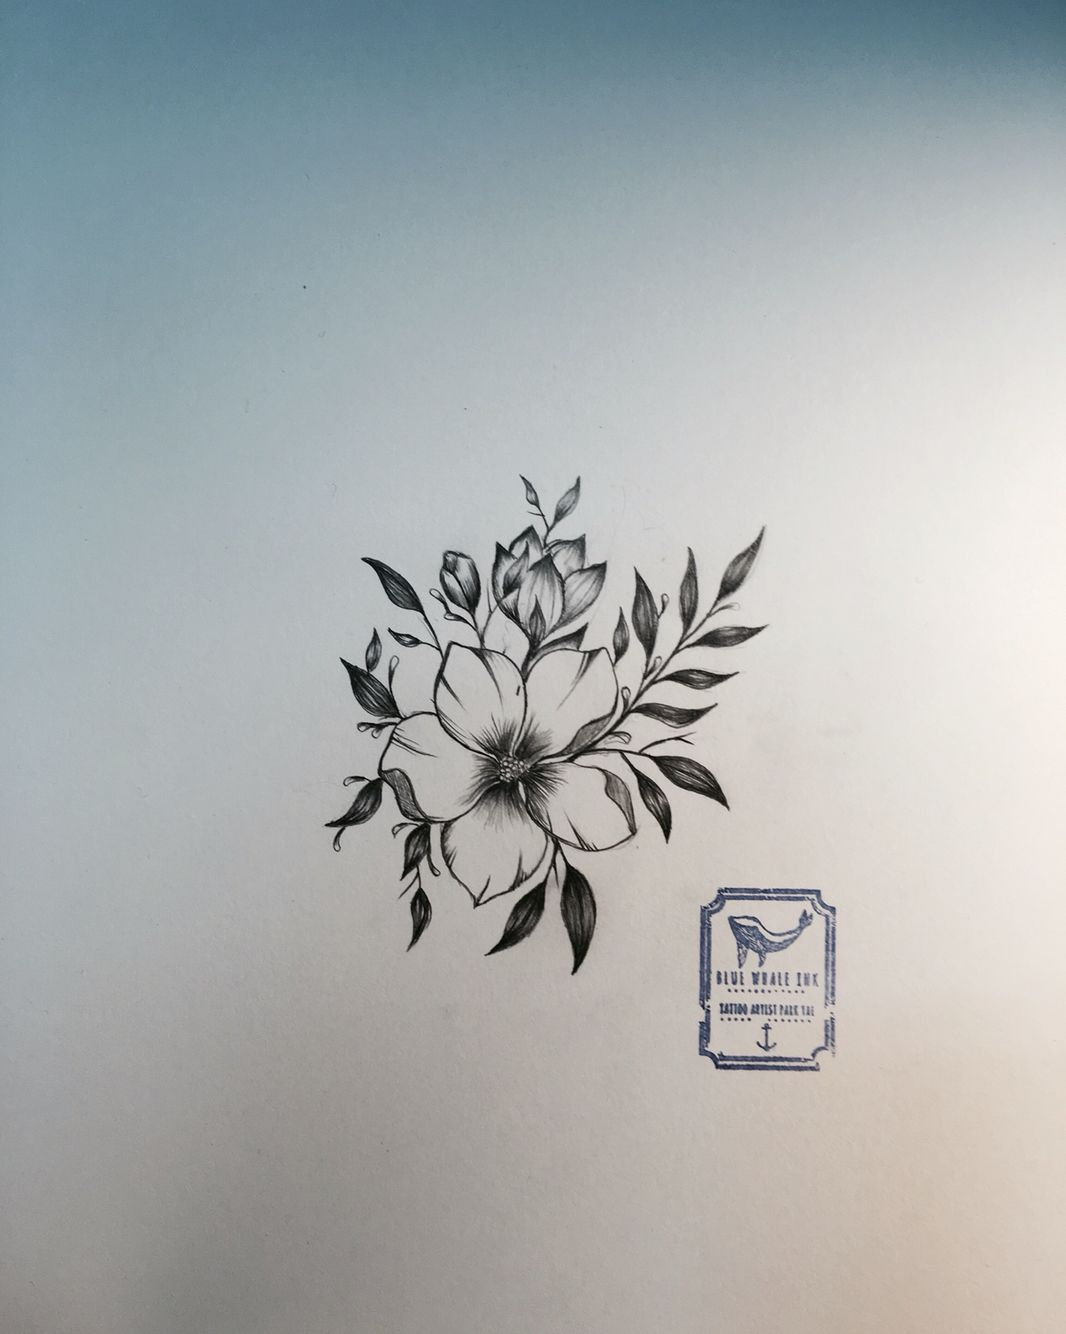 Single Flower Tattoo Design From Blue Whale Ink Design By Park Tae Work In Korea Seoul Hongdae K Flower Tattoo Designs Flower Tattoo Simple Flower Tattoo